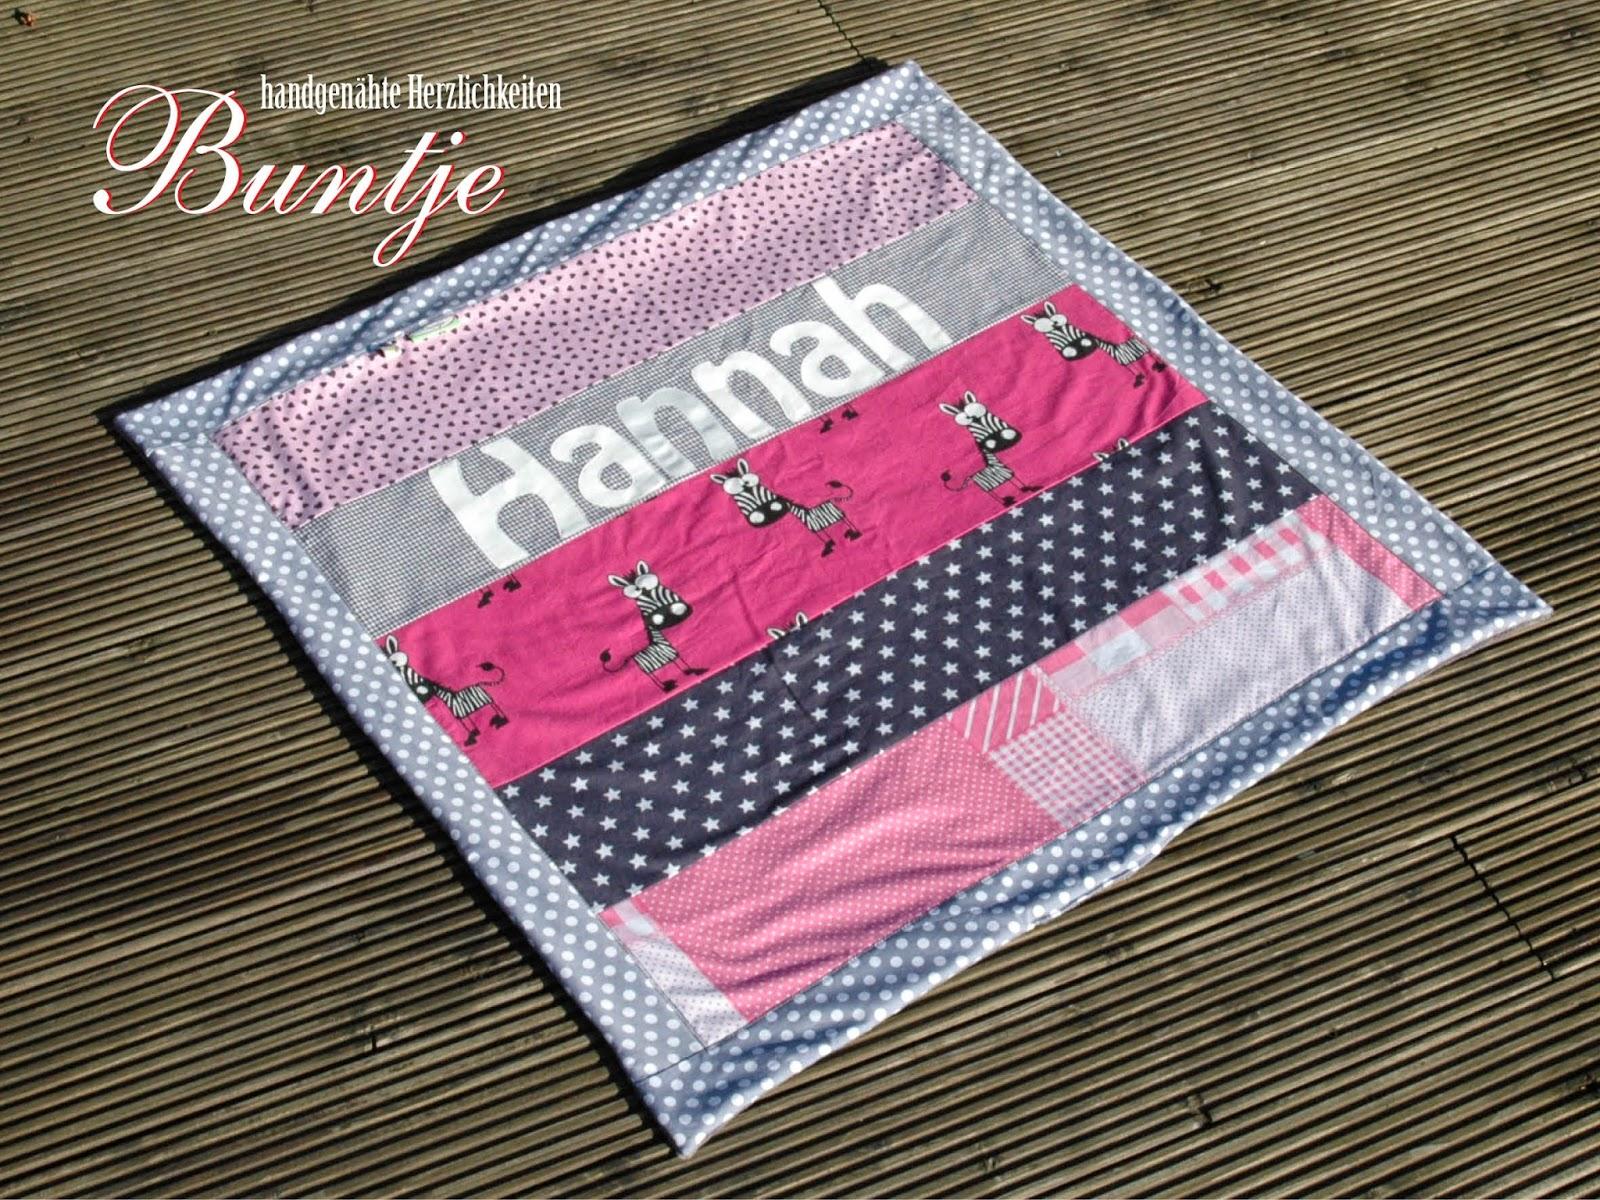 Krabbeldecke Kuscheldecke Decke Baby Name Geschenk Geburt Taufe Mädchen rosa pink Zebra Dschungel Fleece Baumwolle Hannah Buntje nähen